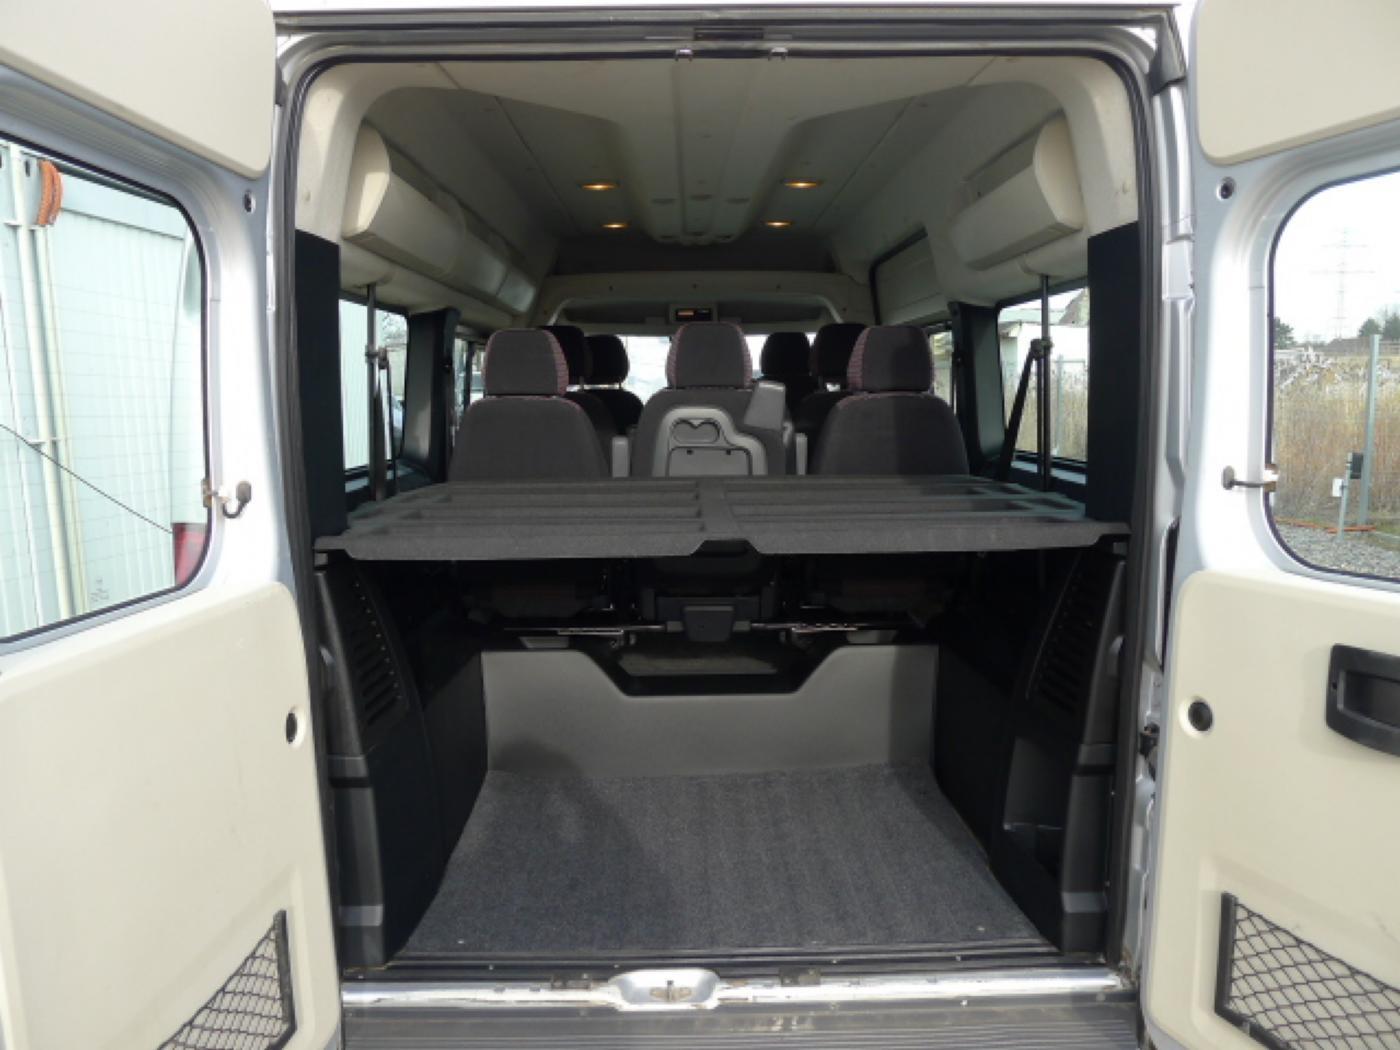 Peugeot Boxer 2,2 HDI PANORAMA 8míst+2 x klima+We - 6